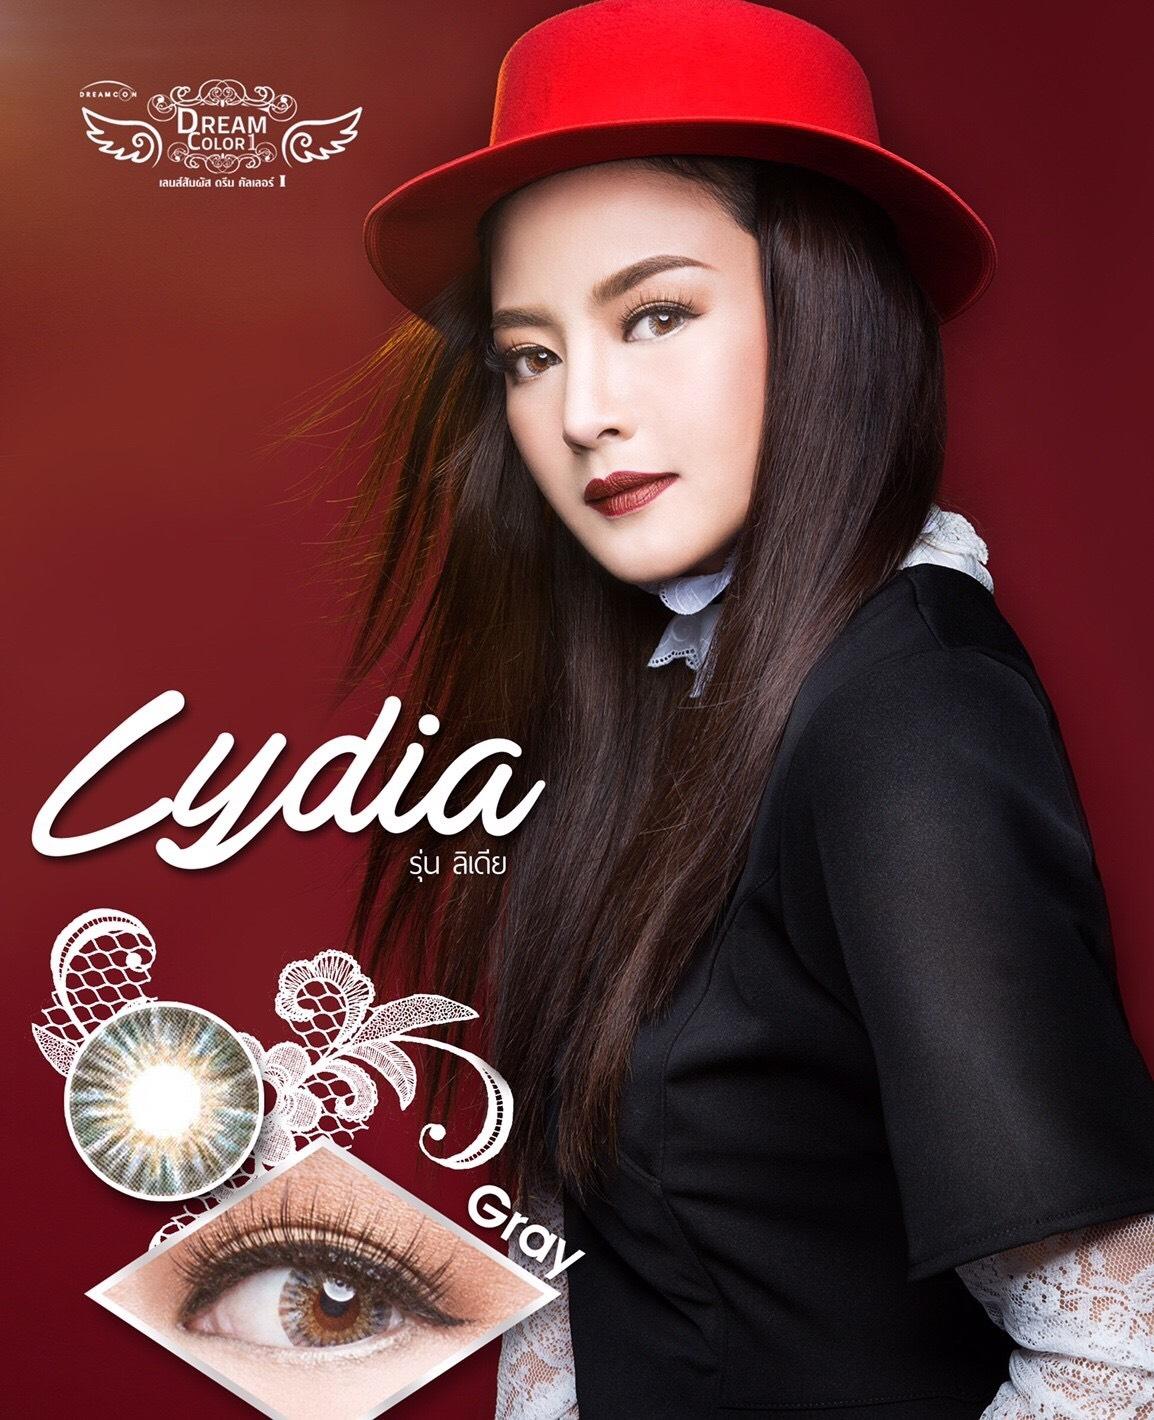 Lydia dreamcolor1 คอนแทคเลนส์ 4 โทนไม่ตัดขอบ